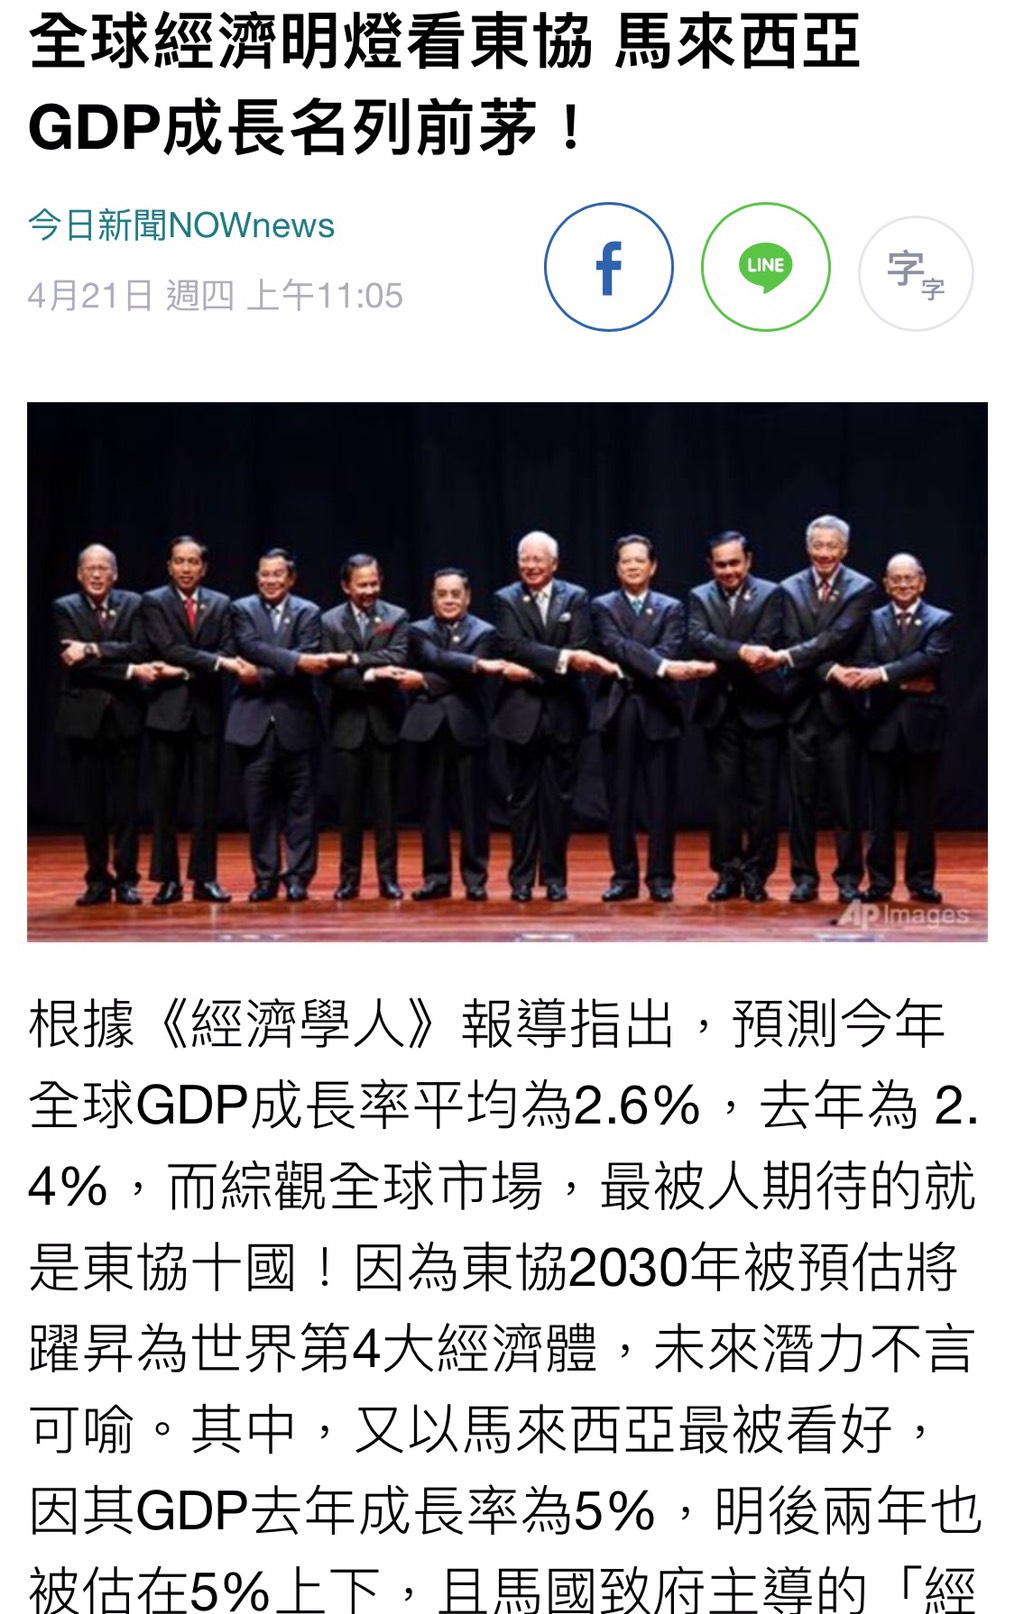 %e5%8f%b0%e7%81%a3%e7%b6%93%e6%bf%9f%e6%88%90%e9%95%b716